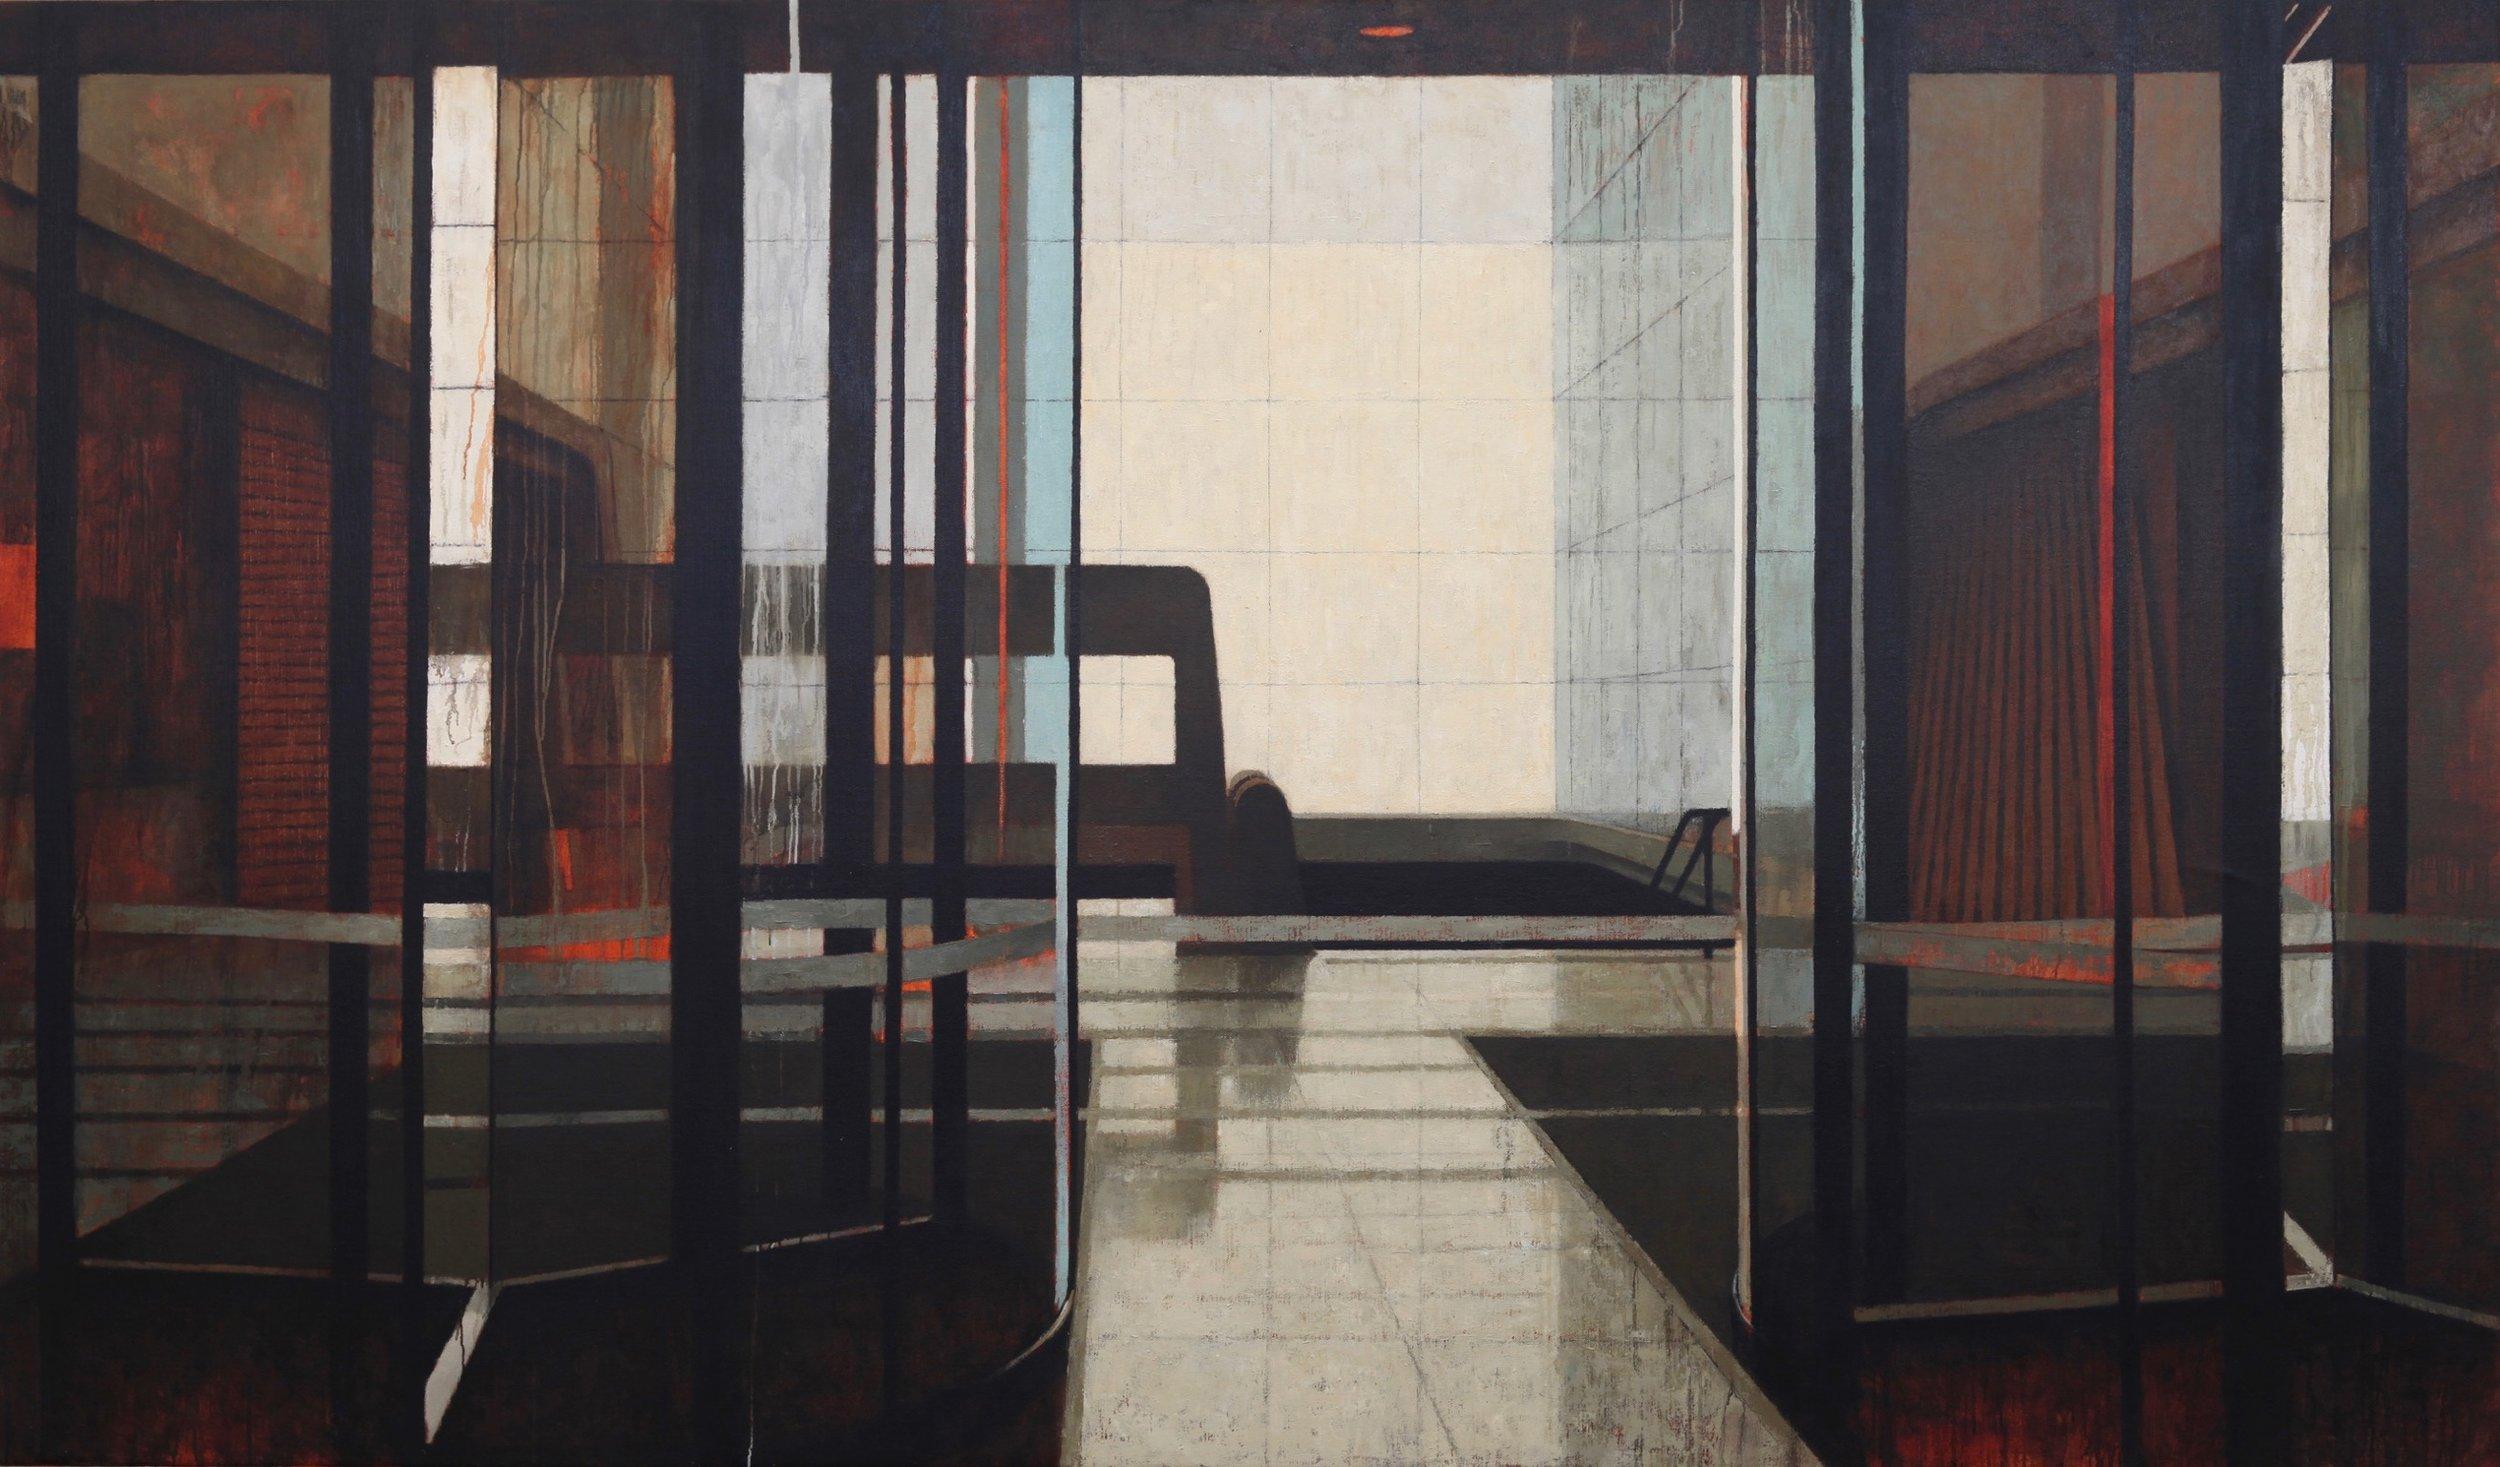 Interior 371 (Foyer II), Oil on linen, 2600mm x 1500mm, 2017